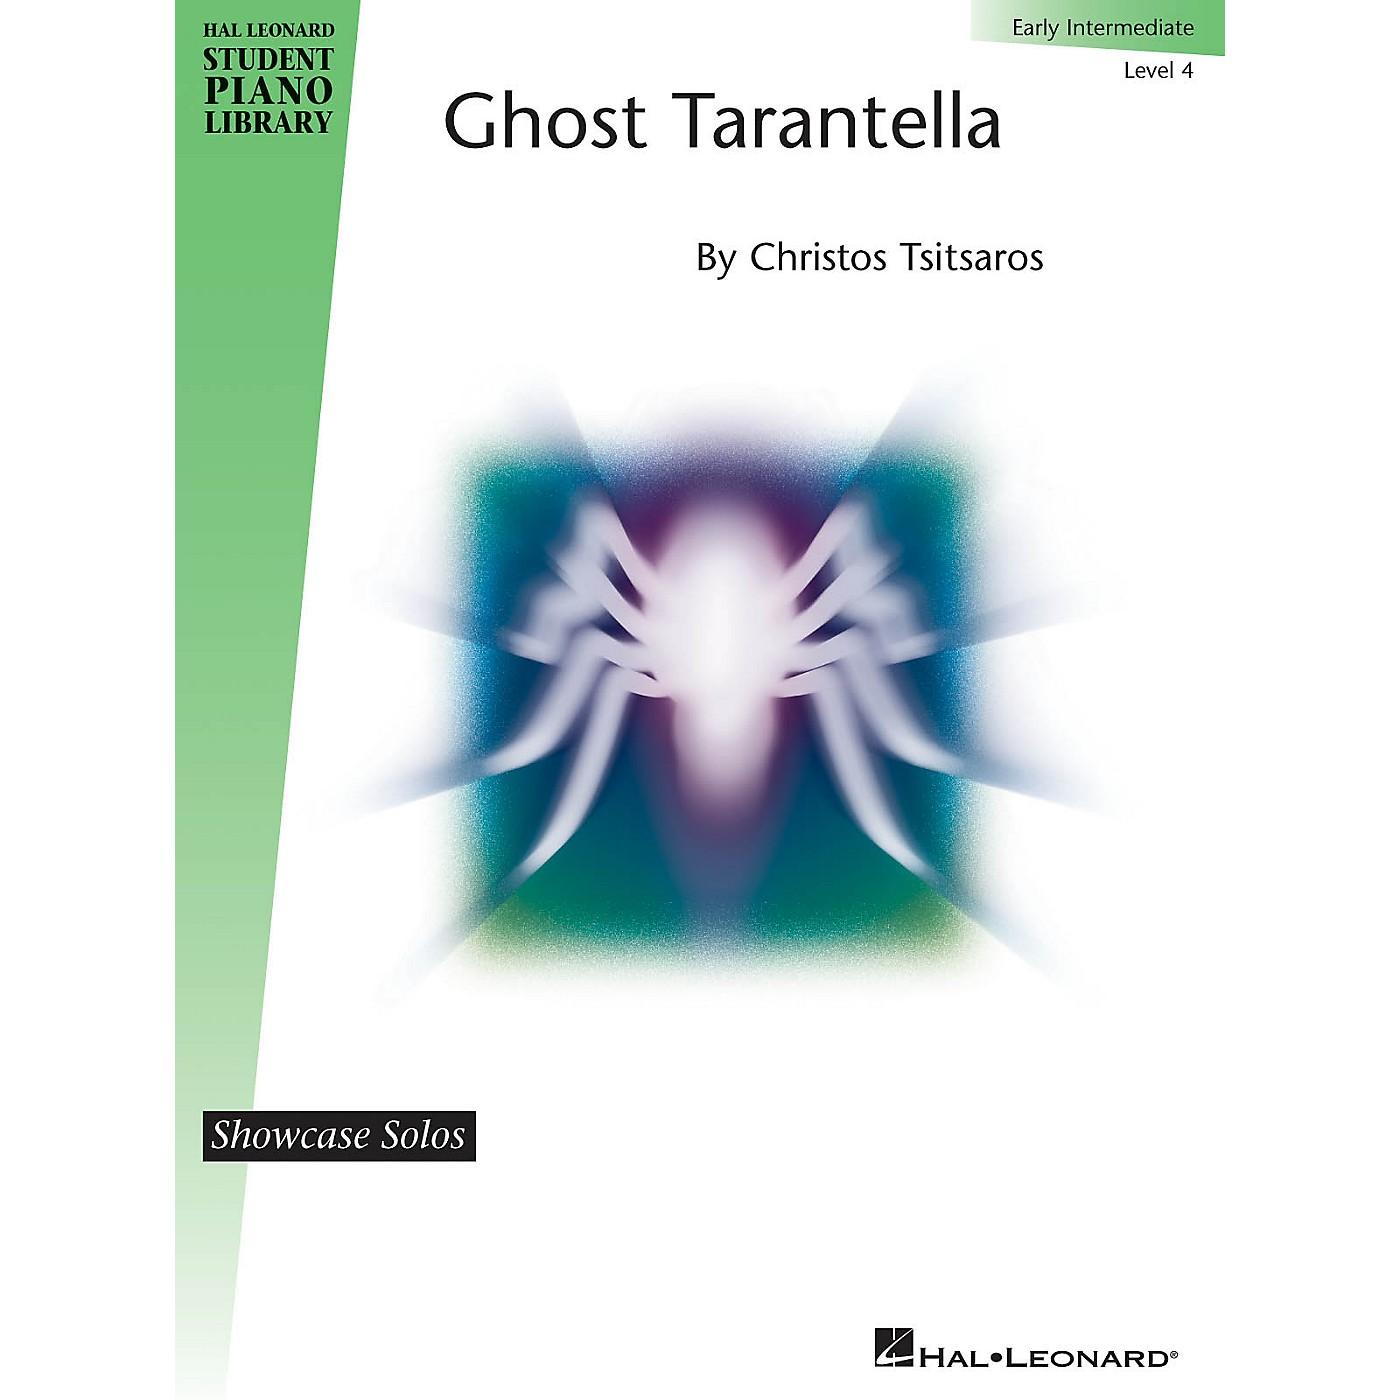 Hal Leonard Ghost Tarantella Piano Library Series by Christos Tsitsaros (Level Early Inter) thumbnail